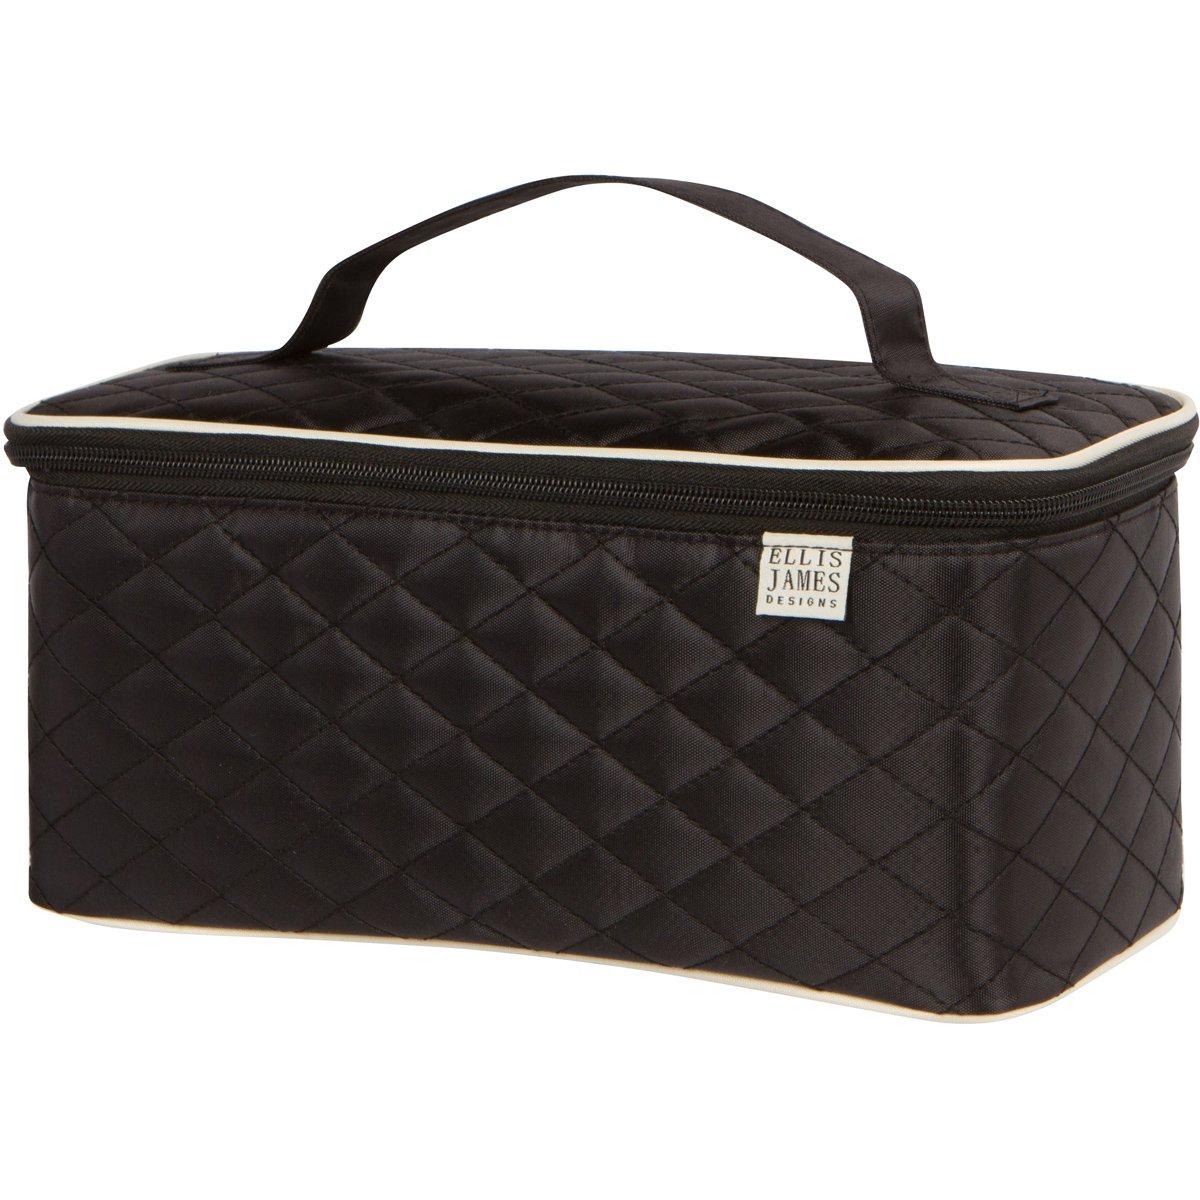 Ellis James Designs Large Travel Makeup Bag Organizer, Cosmetic Train Case Bag Toiletry Organizer (Black) with Handle & Makeup Brush Holders - Multifunctional for Professional Hair & Beauty Storage